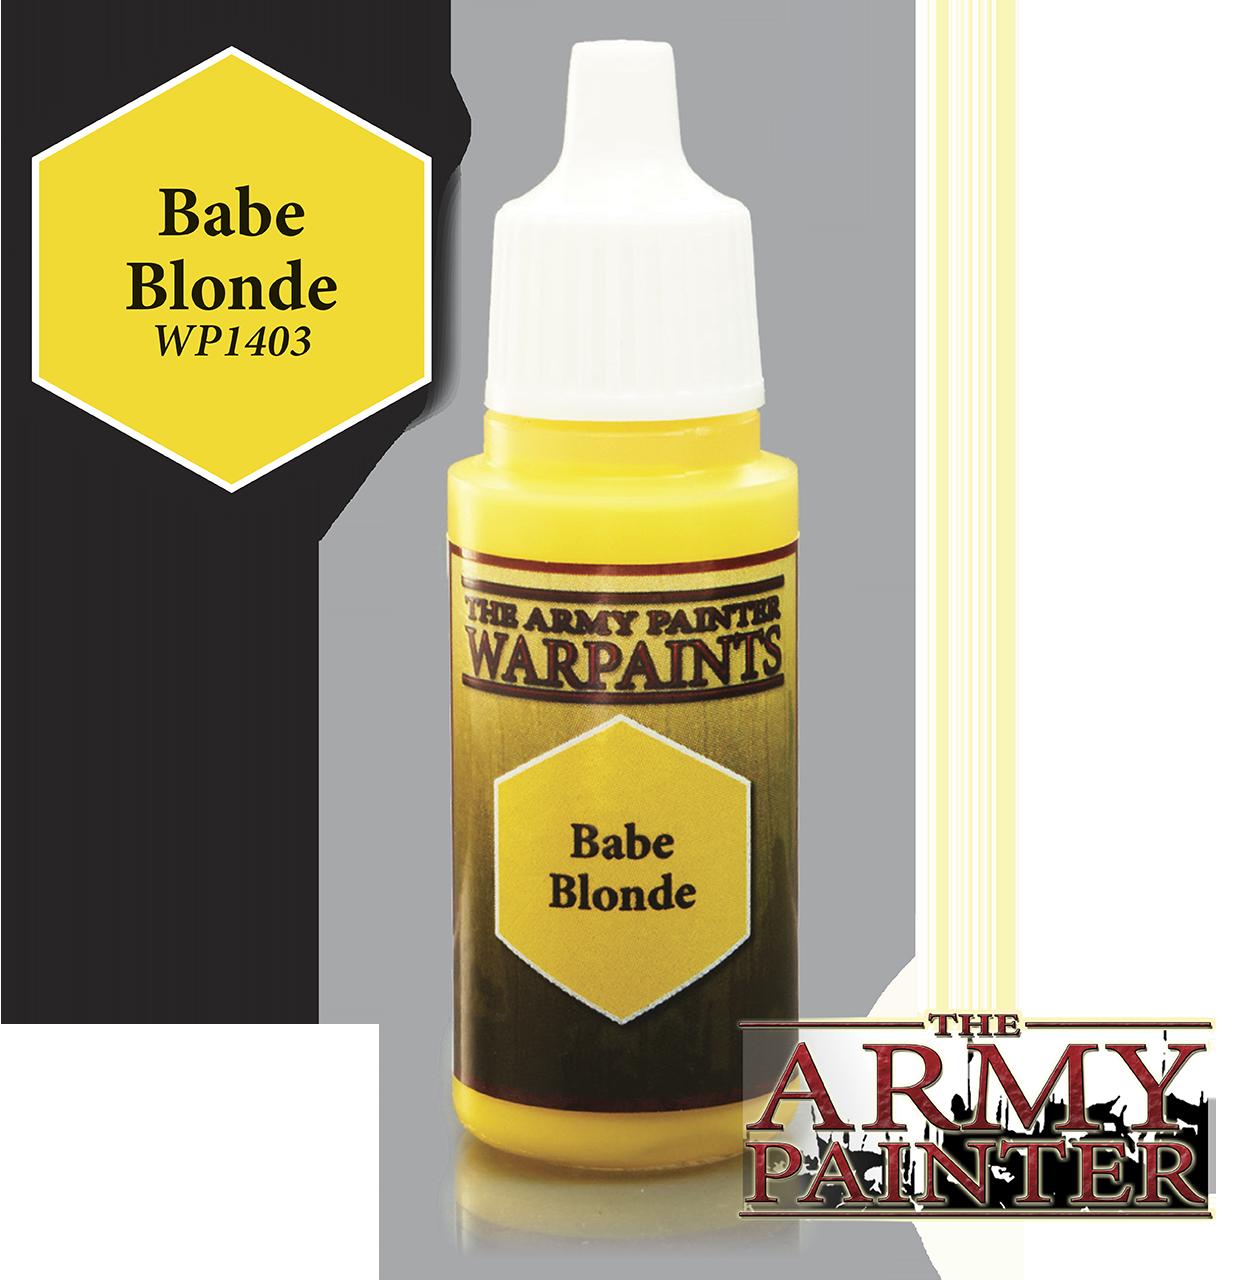 Babe Blonde - Army Painter Warpaints